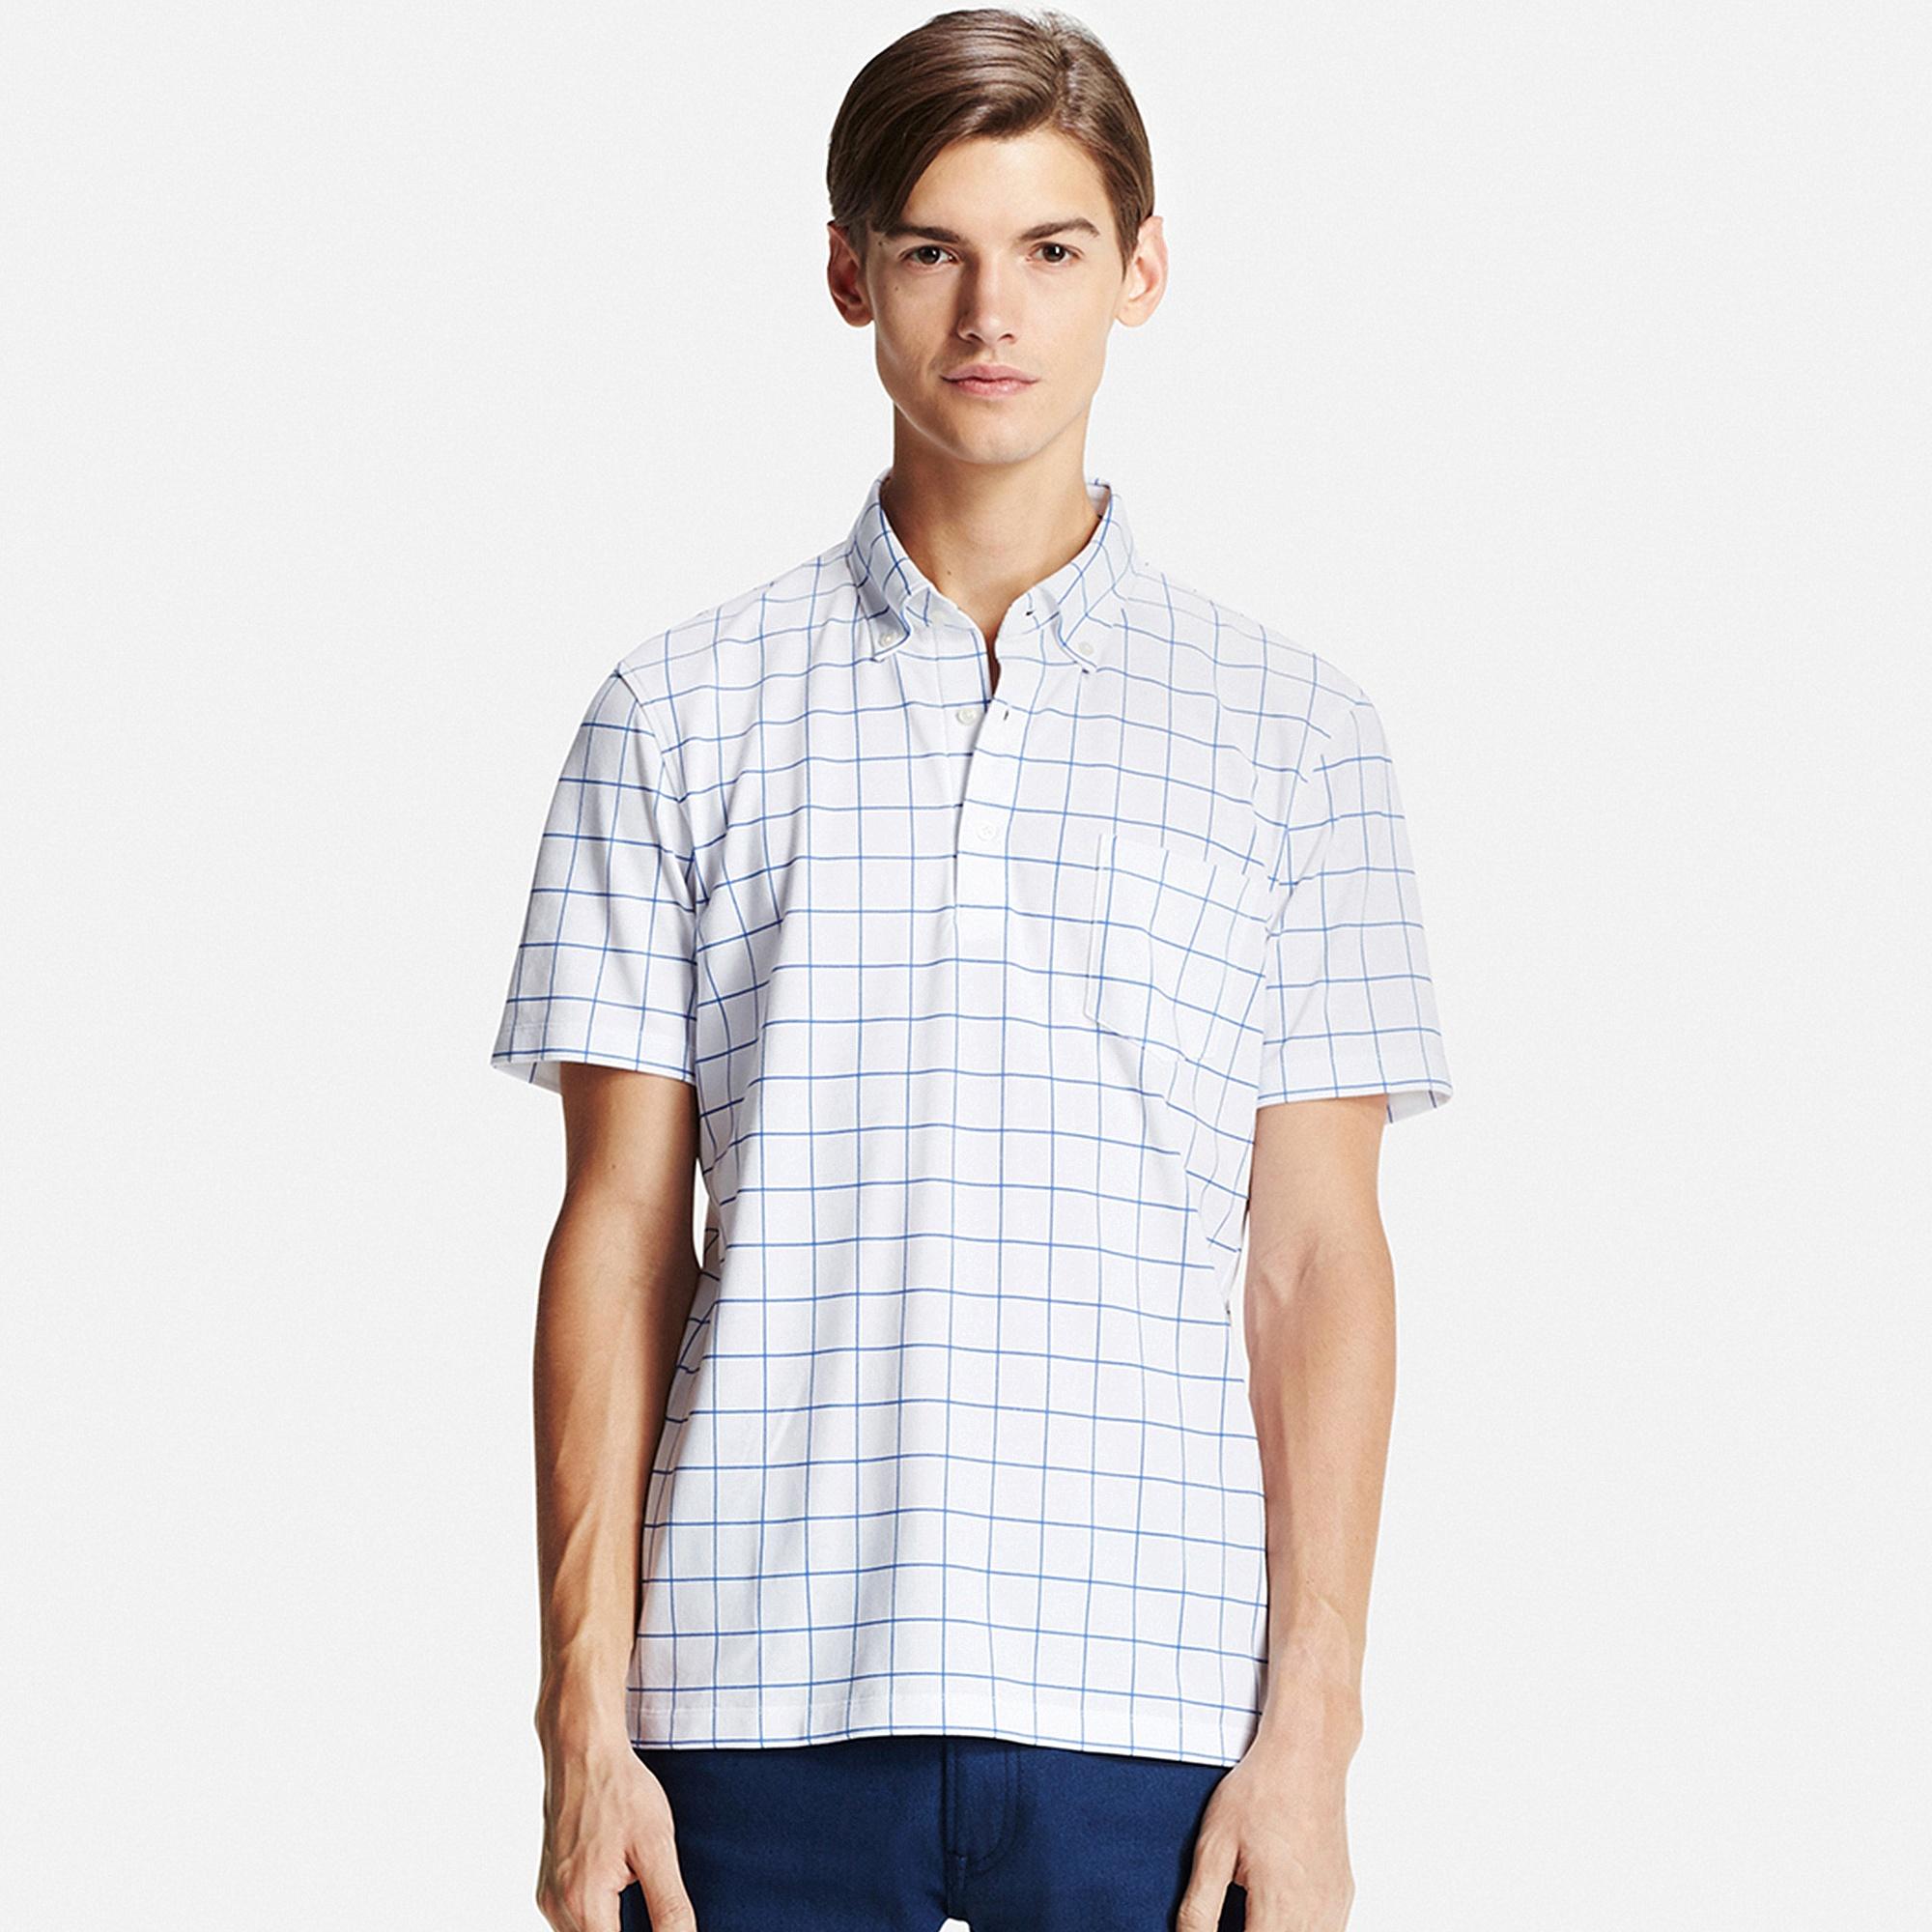 Uniqlo: Heattech Apparel $10, Men's Polo Shirts (3XL)  $3.90 + Free Shipping